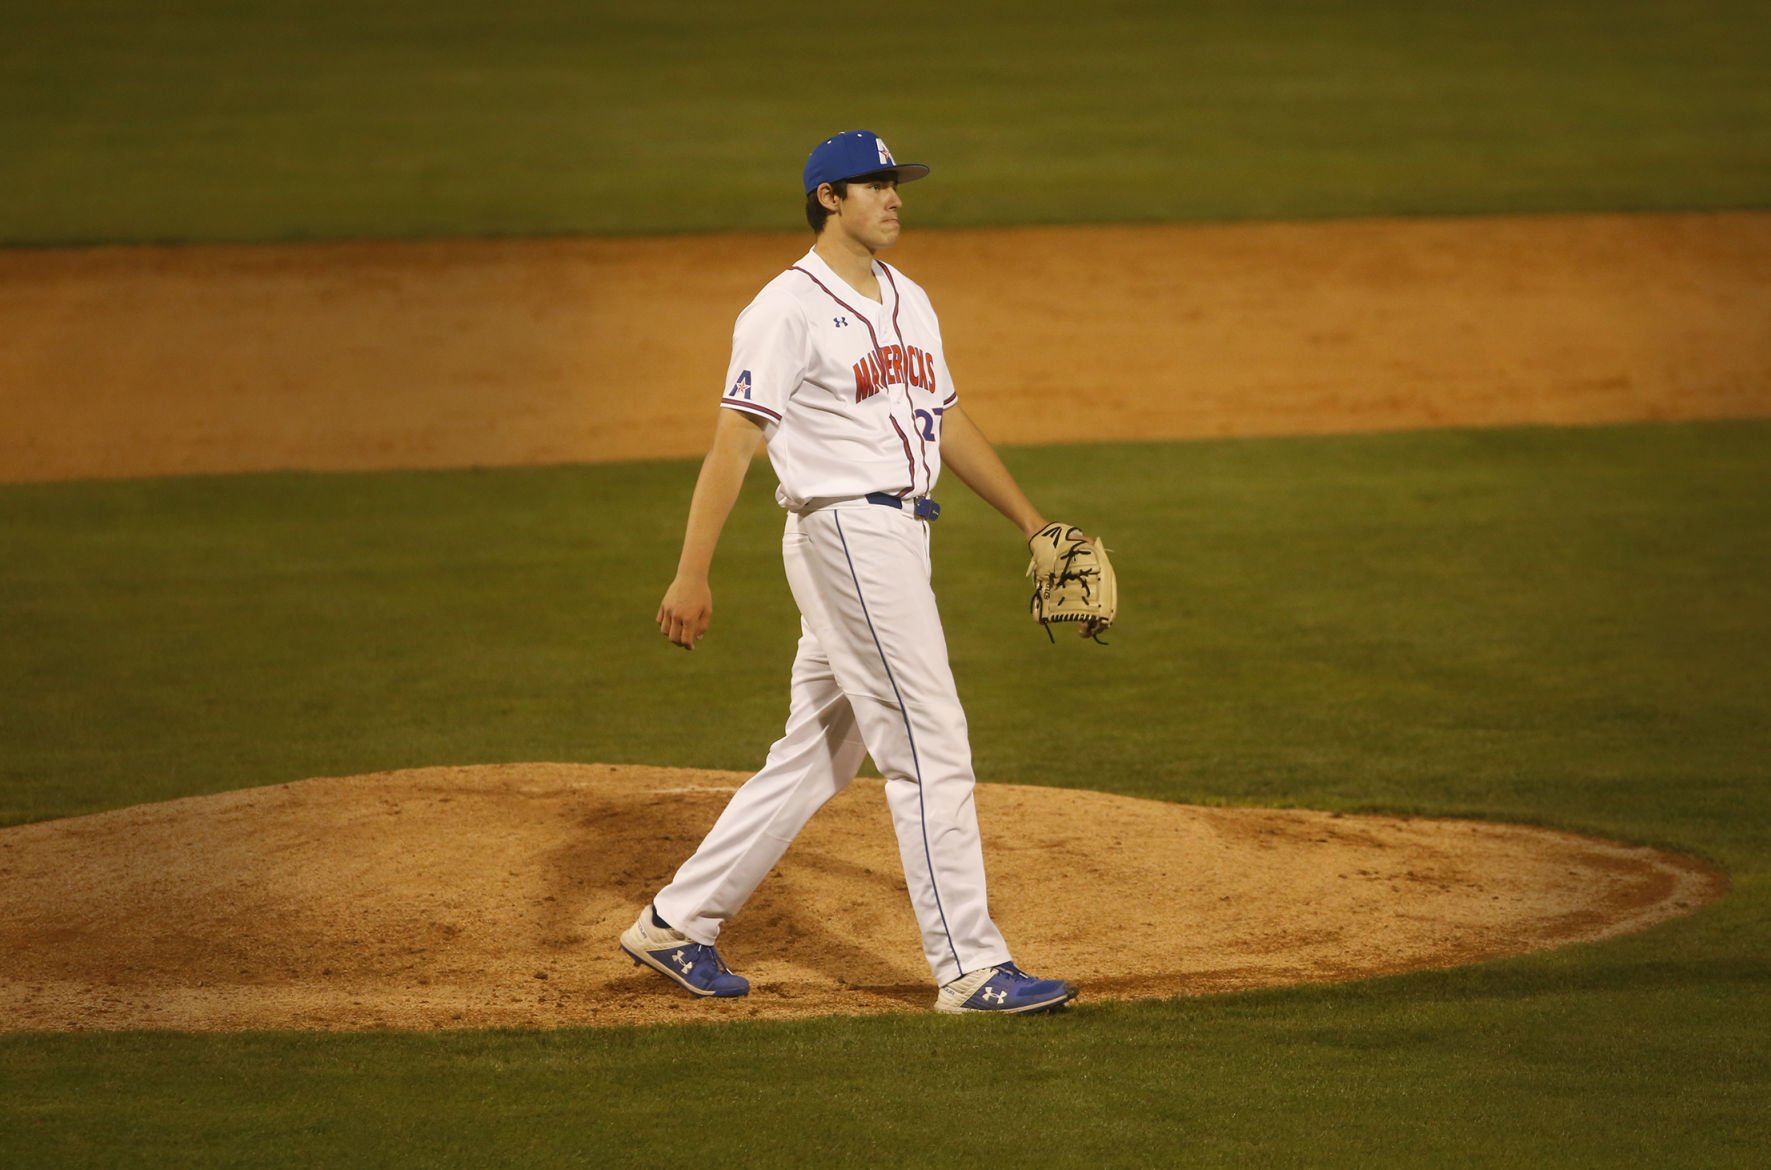 UTA baseball extends losing streak with loss to Dallas Baptist University